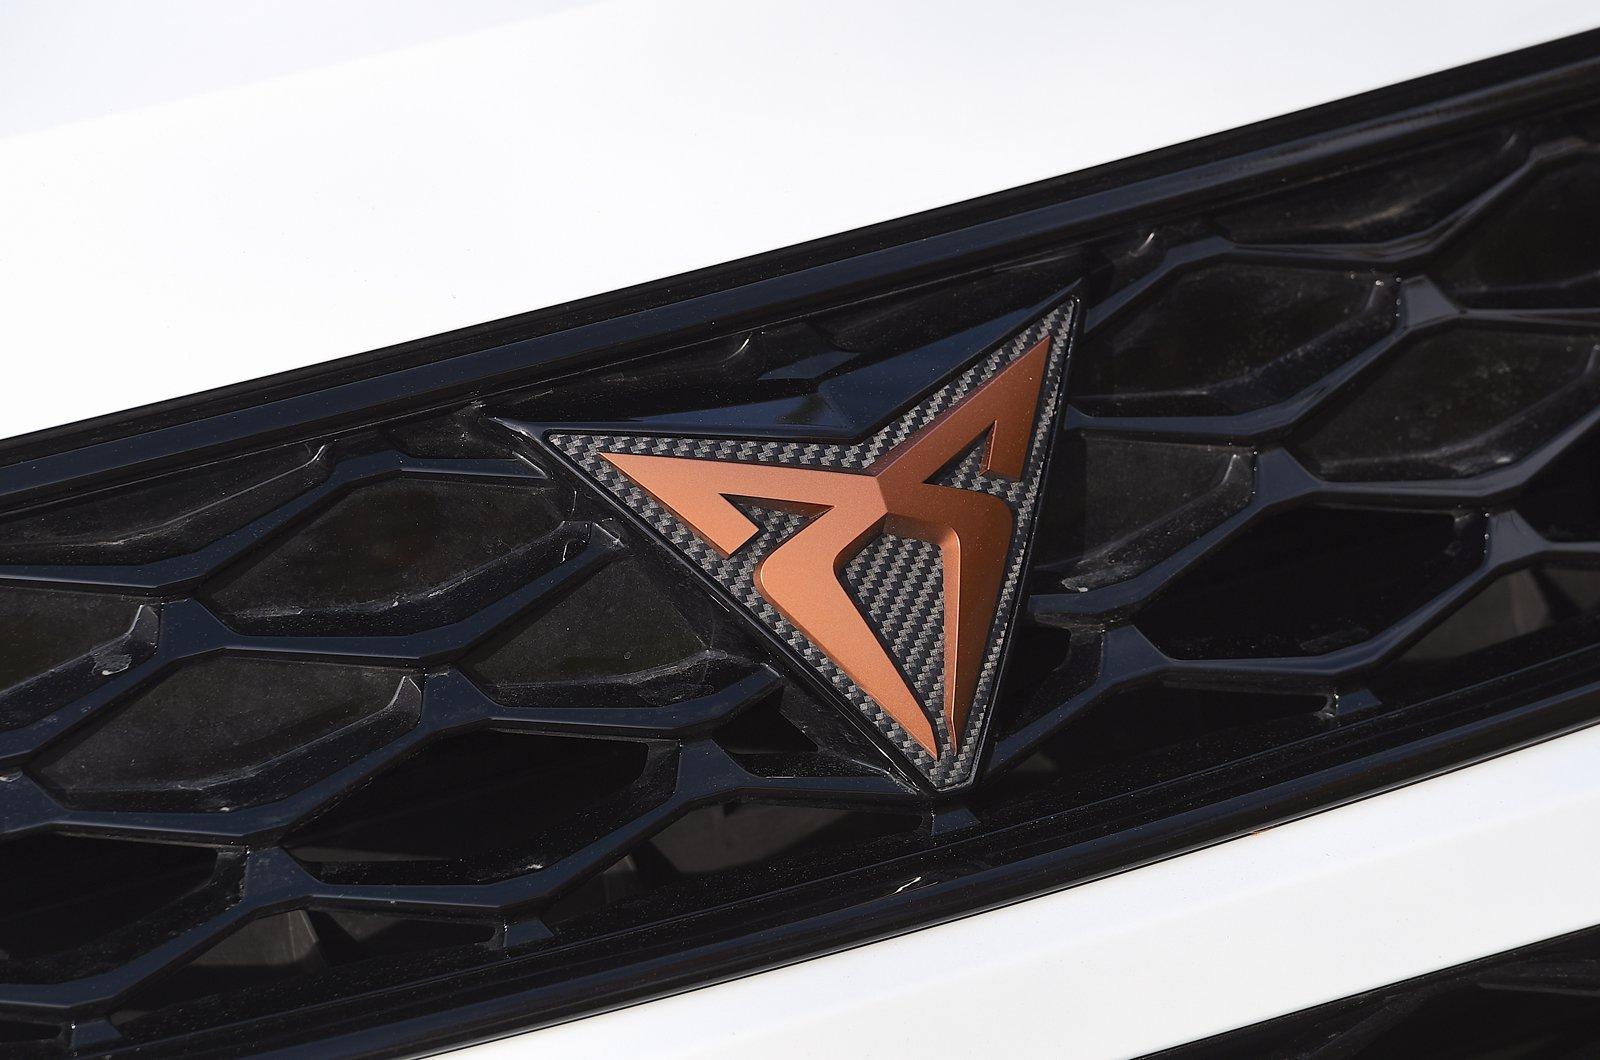 Cupra Ateca front grille badge